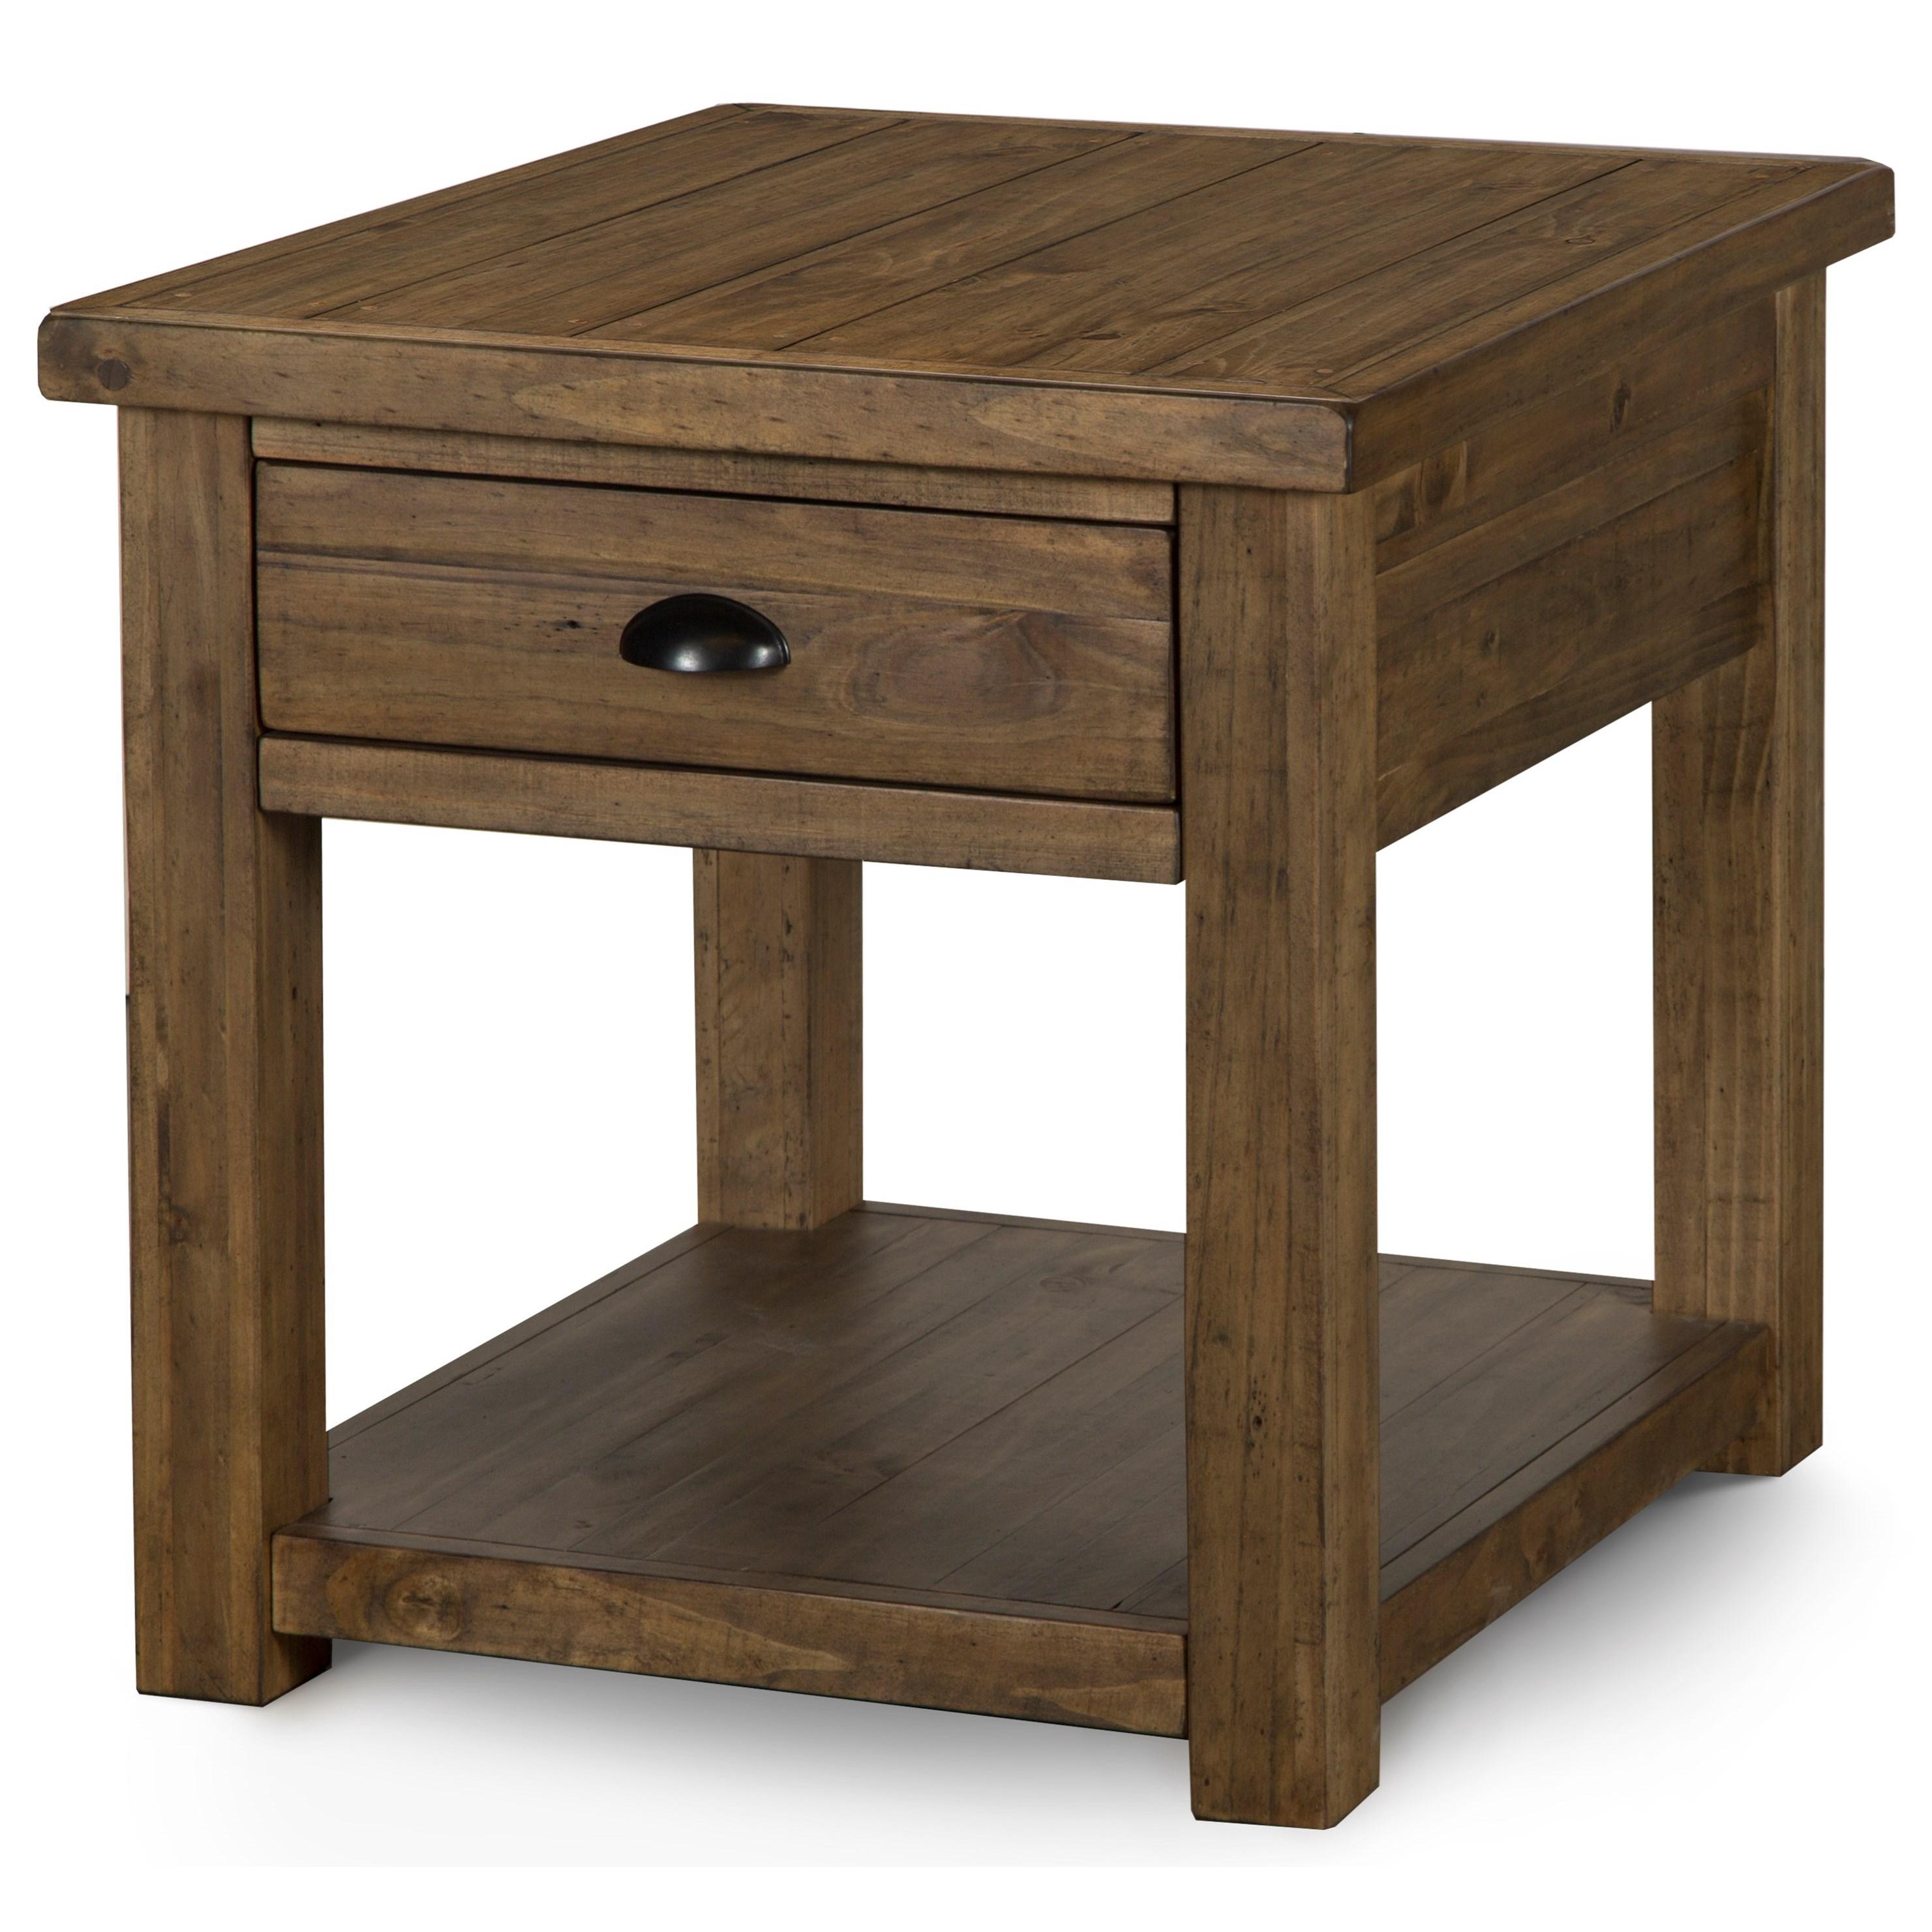 1 Drawer Rectangular End Table in Warm Nutmeg